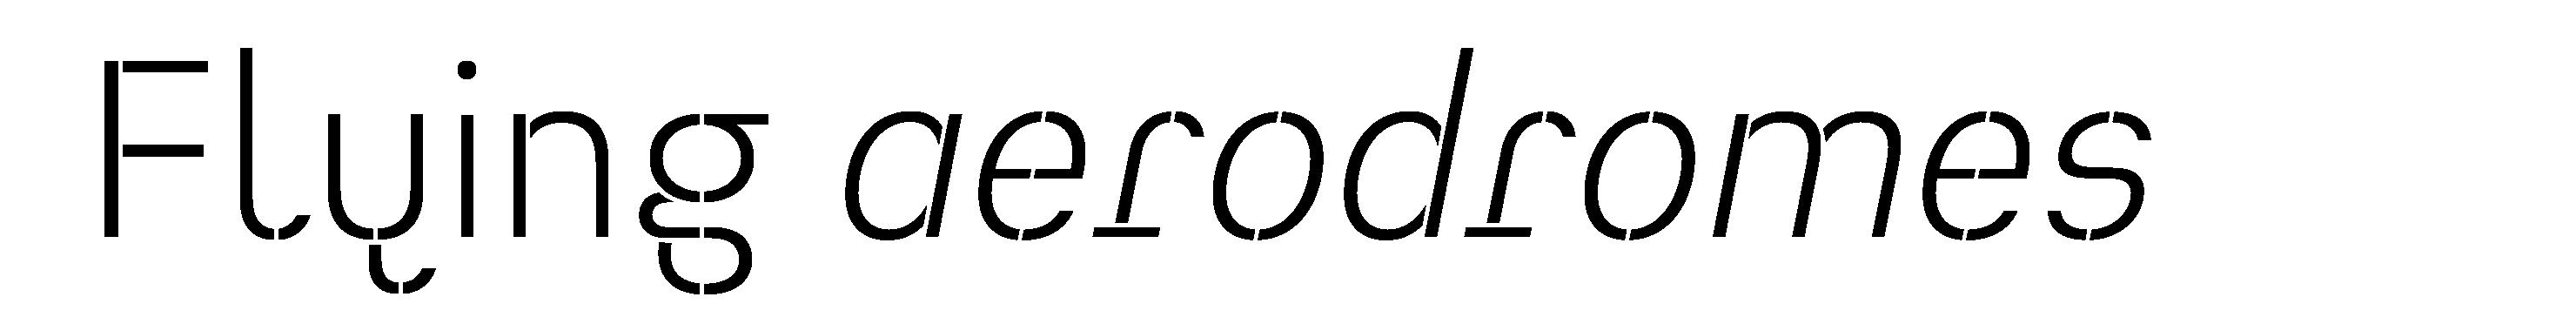 Typeface Heimat Stencil D02 Atlas Font Foundry